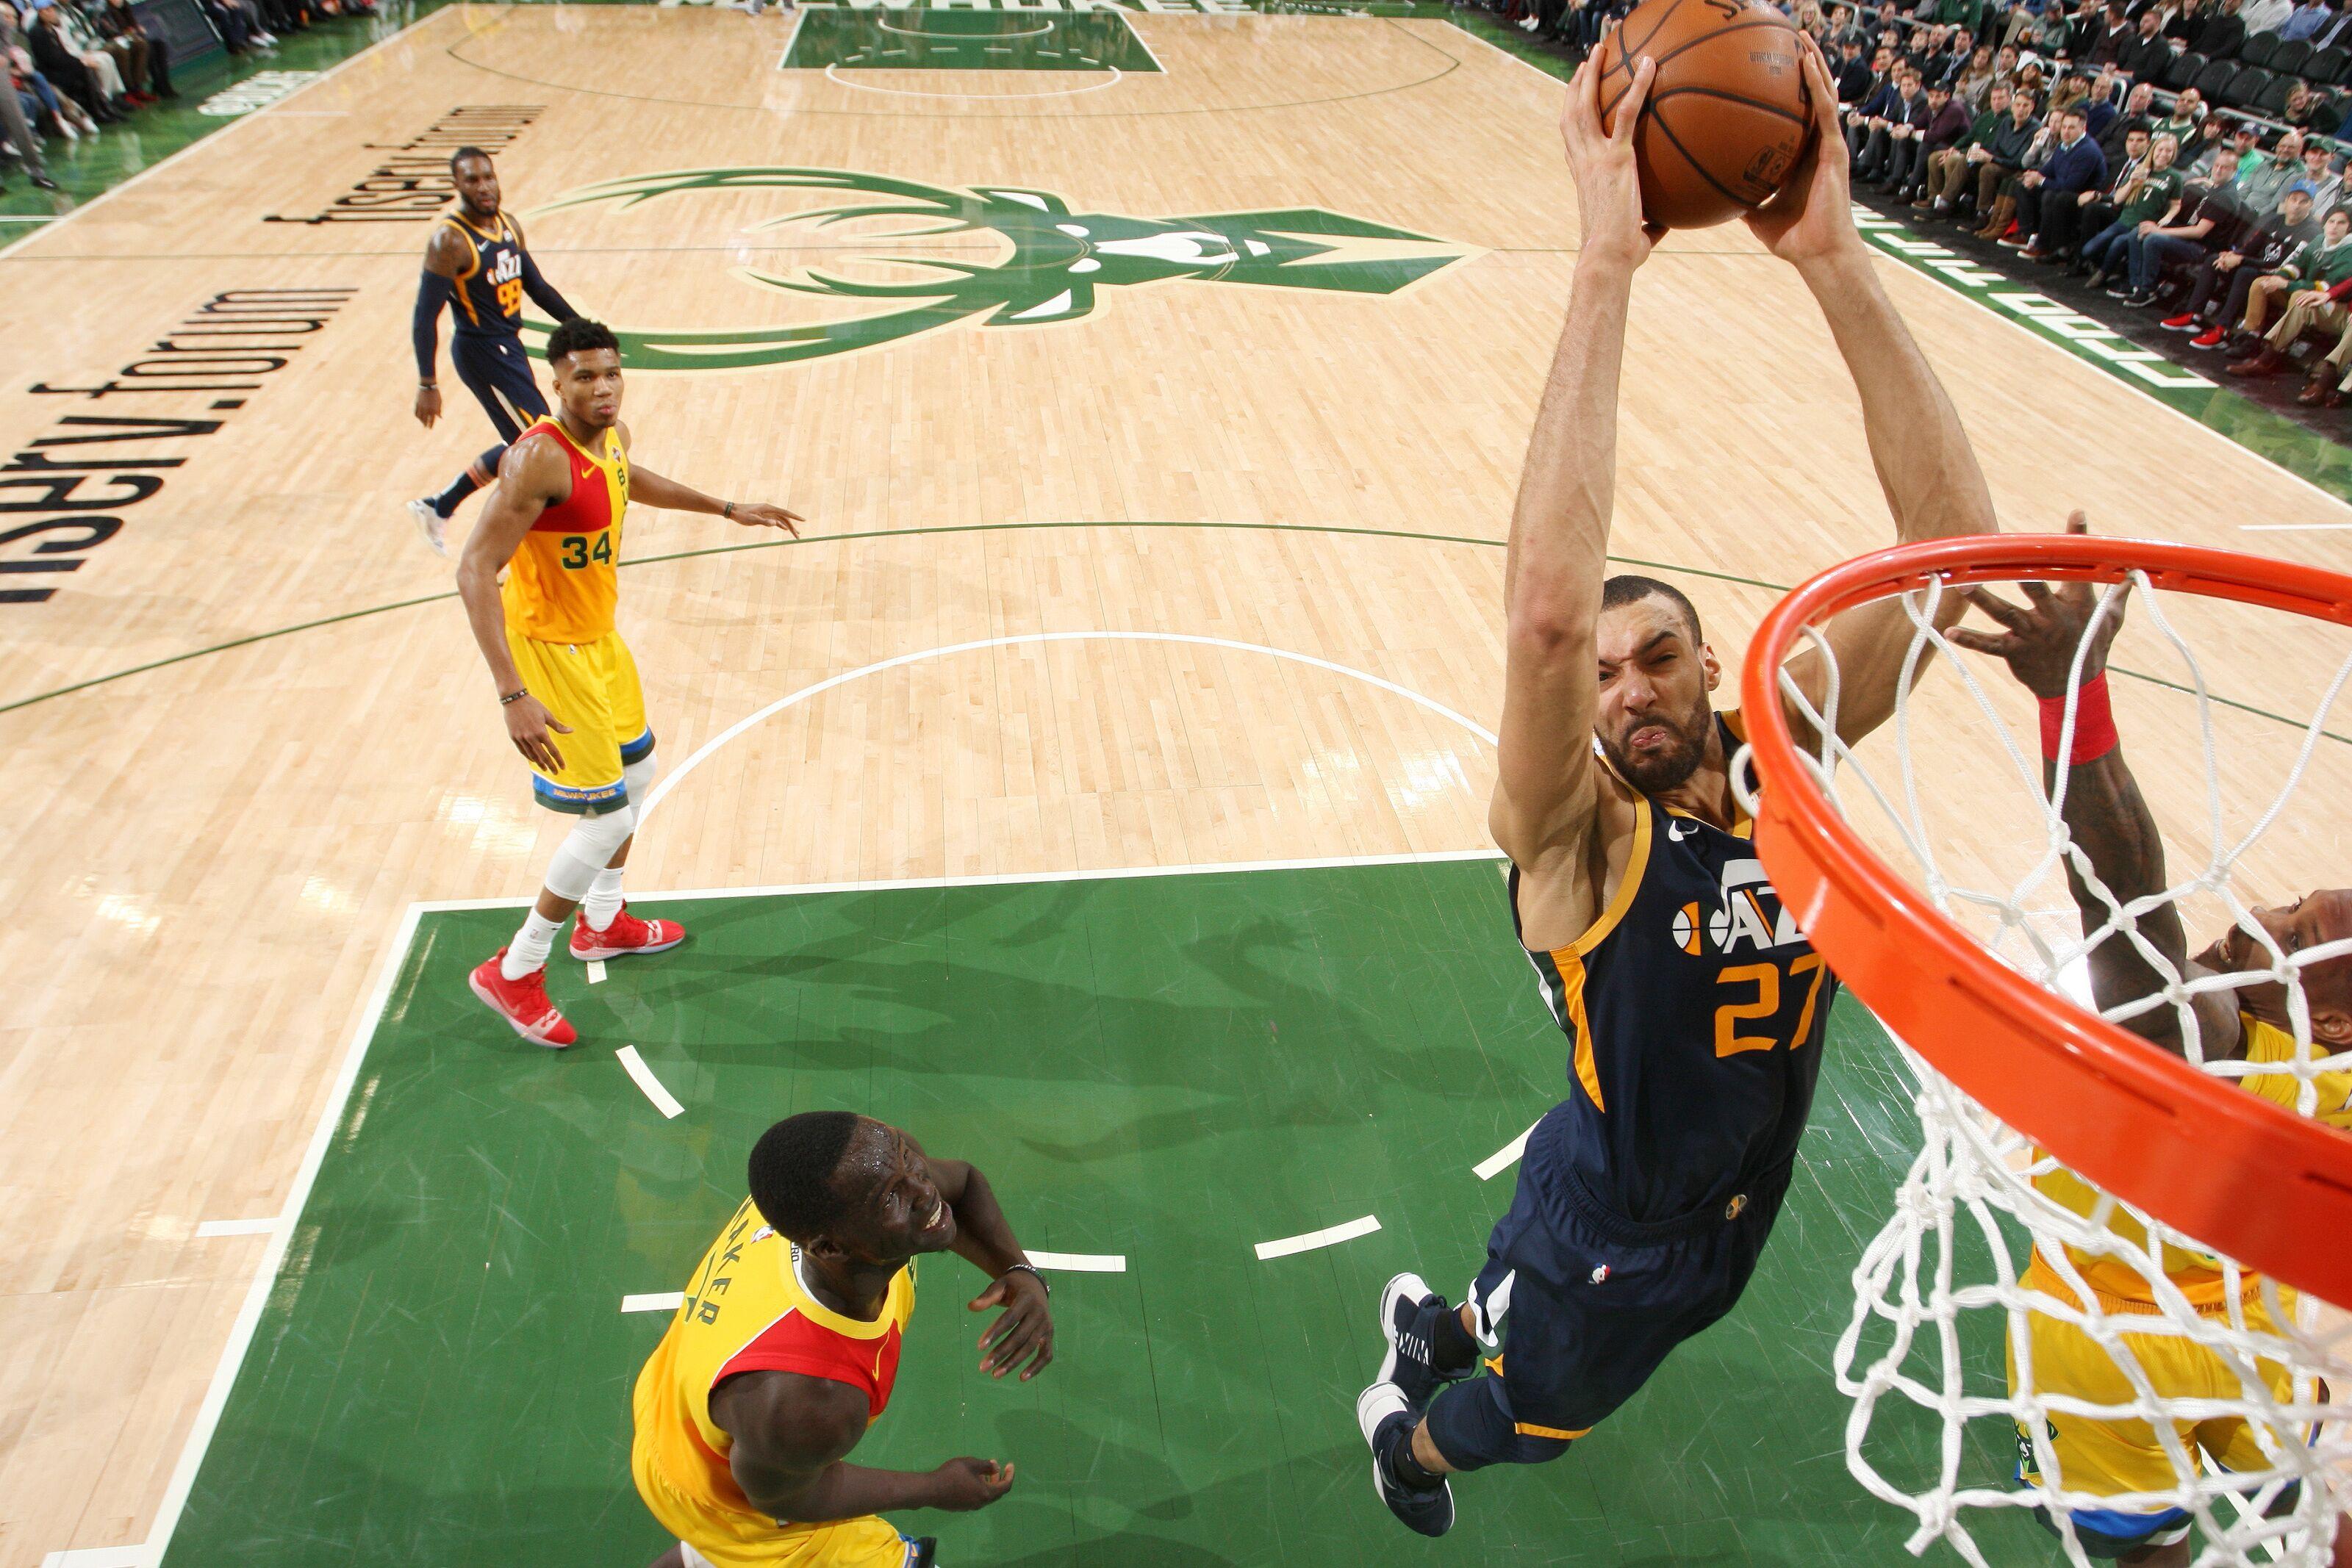 Utah Jazz: Gobert leads Antetokounmpo in race for dunk record